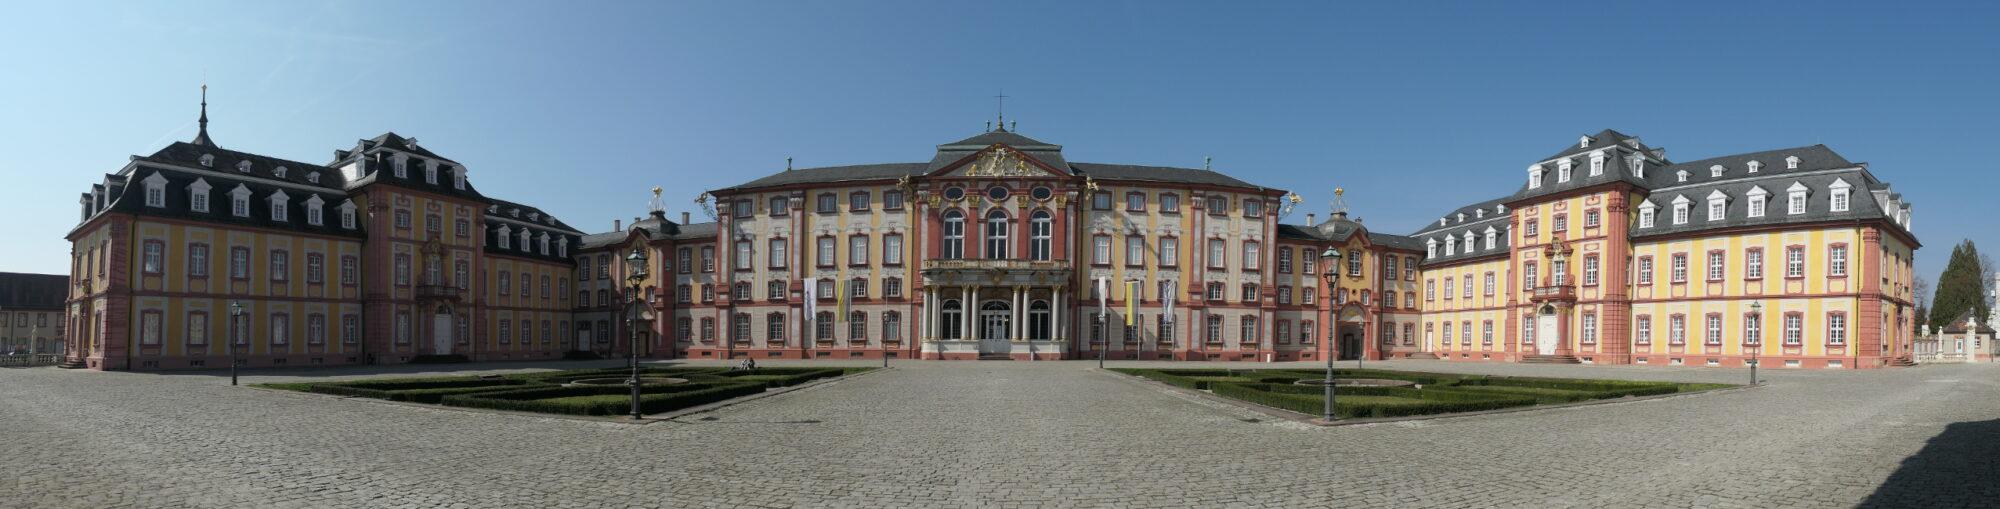 Bruchsal Palace Banner.